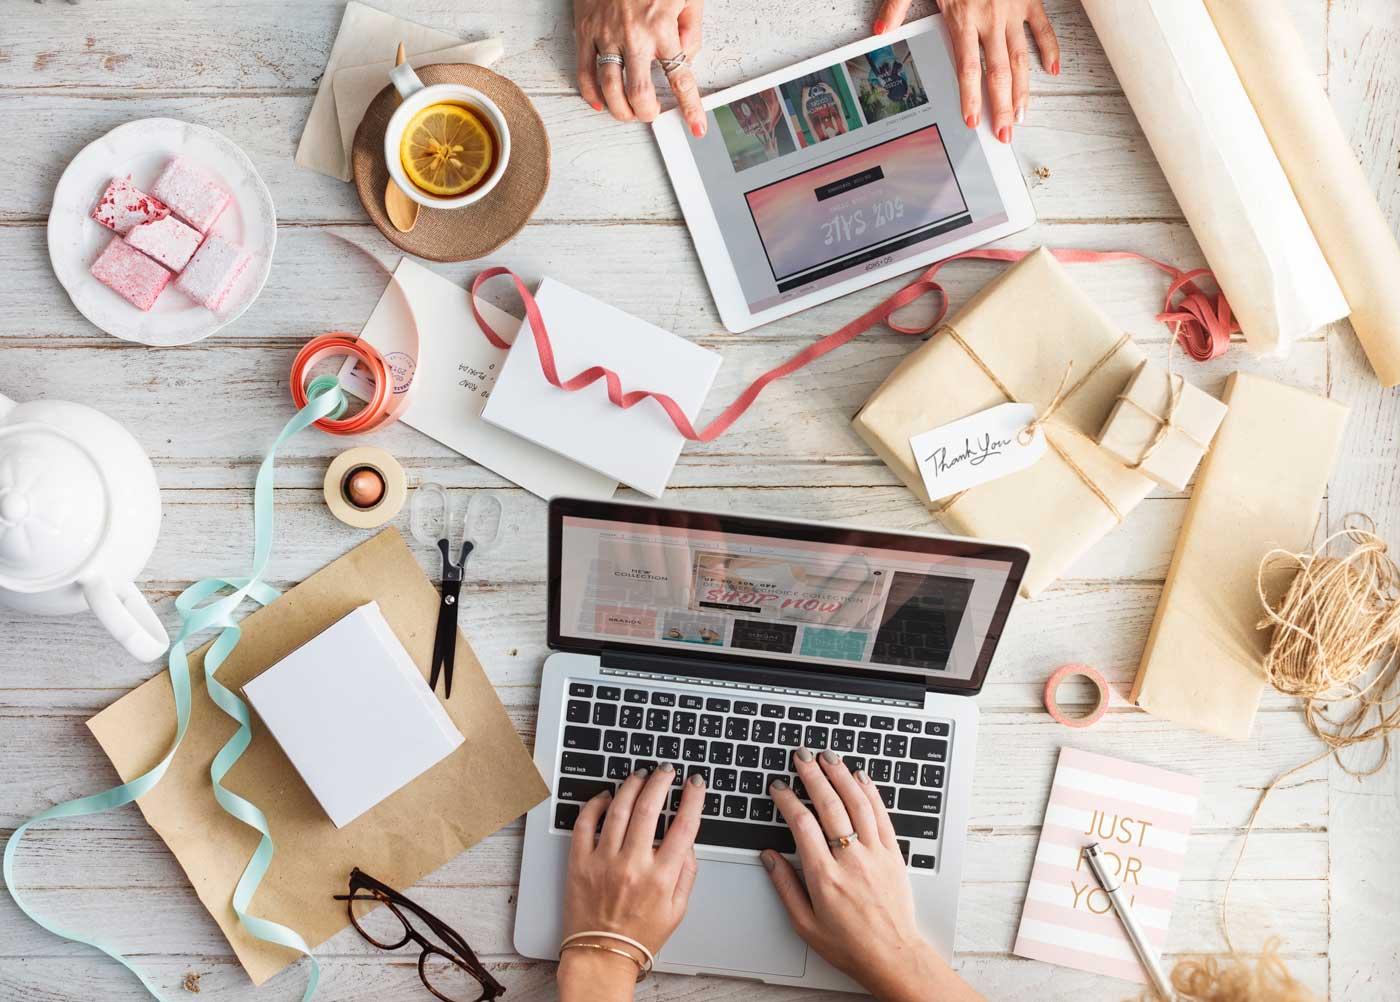 7 Ide Bisnis Online Shop Paling Hits Di 2018 Hafiz Lubis